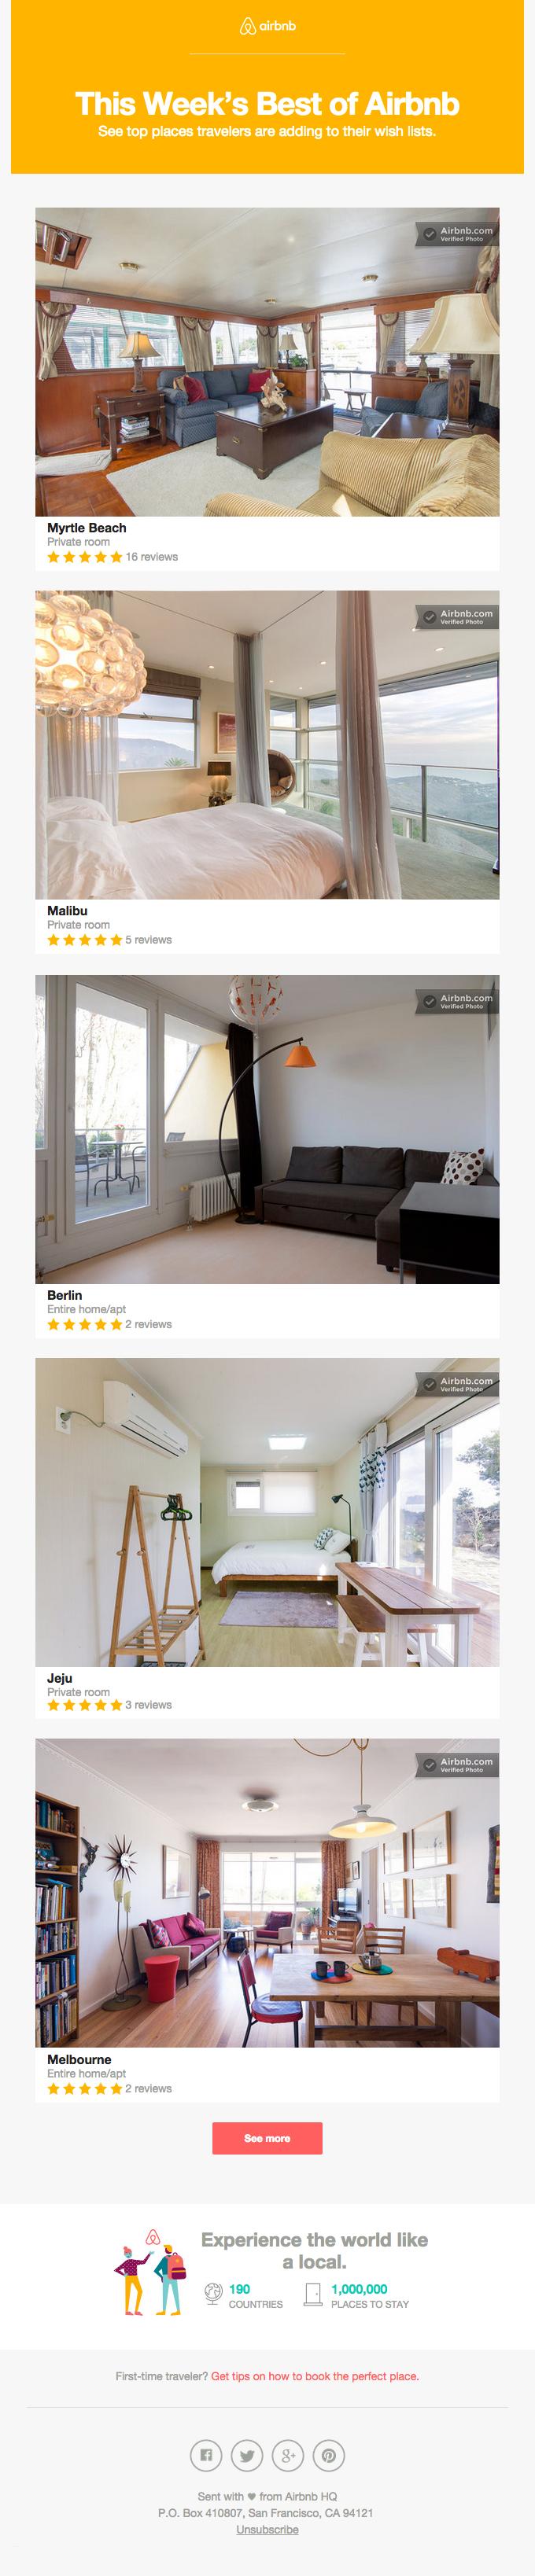 airbnbapple